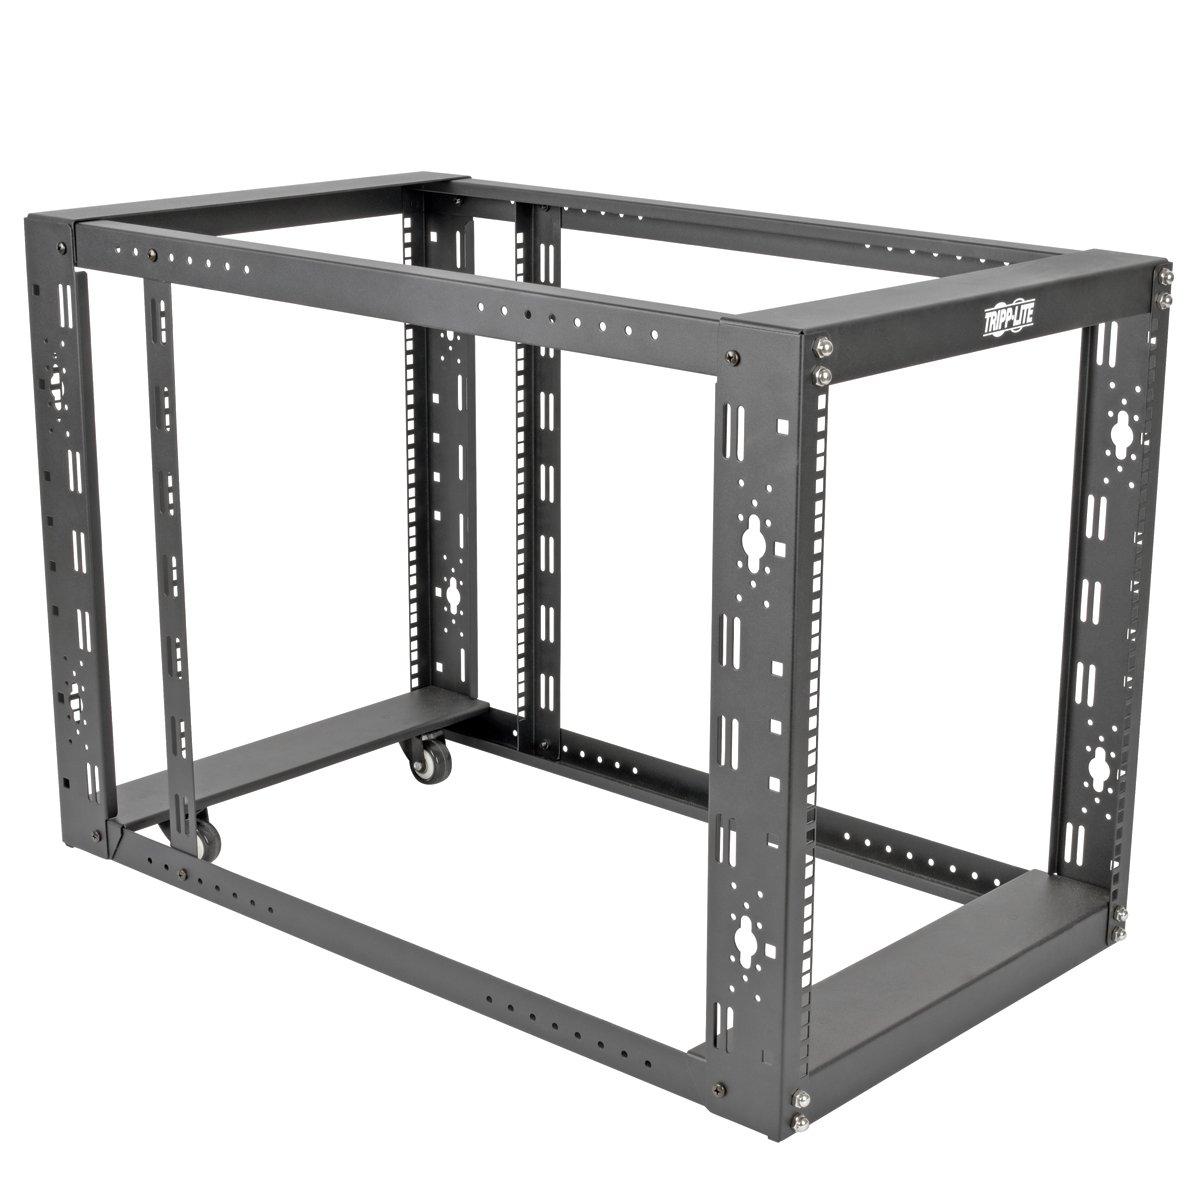 Tripp Lite 12U 4-Post Open Frame Rack Server Cabinet Floor Standing 36'' Depth (SR12UBEXPNDKD) by Tripp Lite